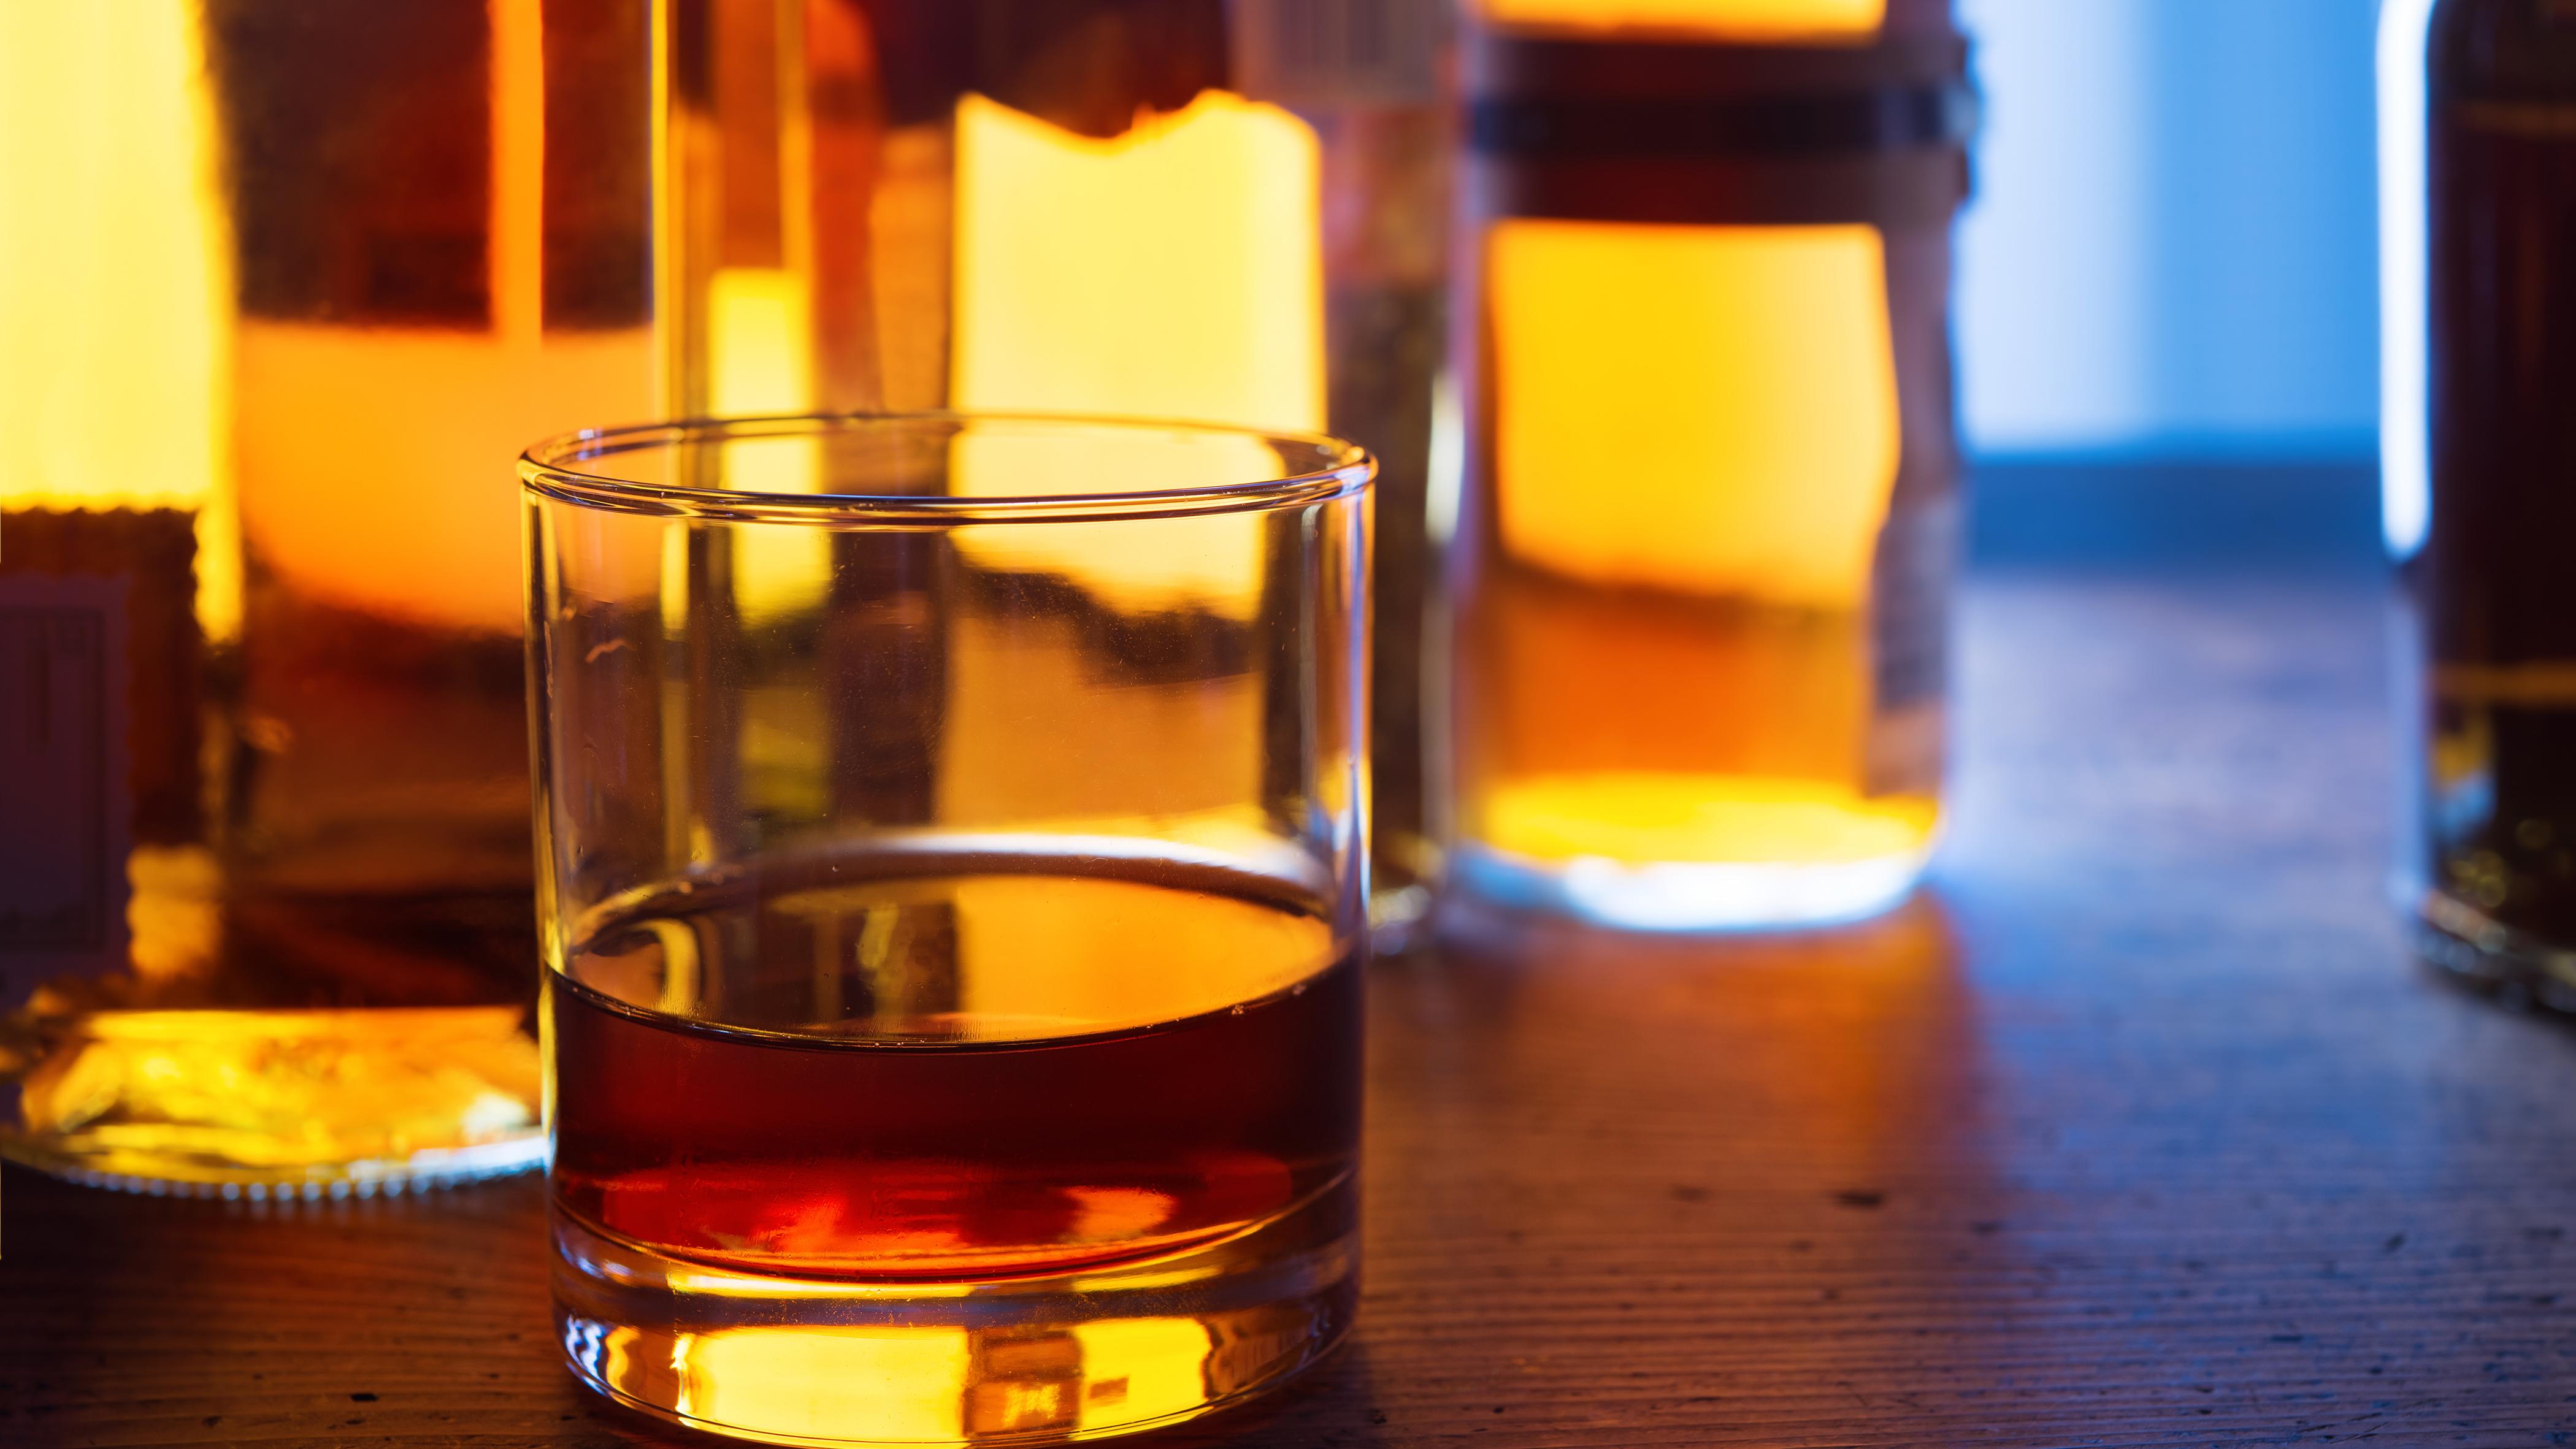 Do christians drink alcohol